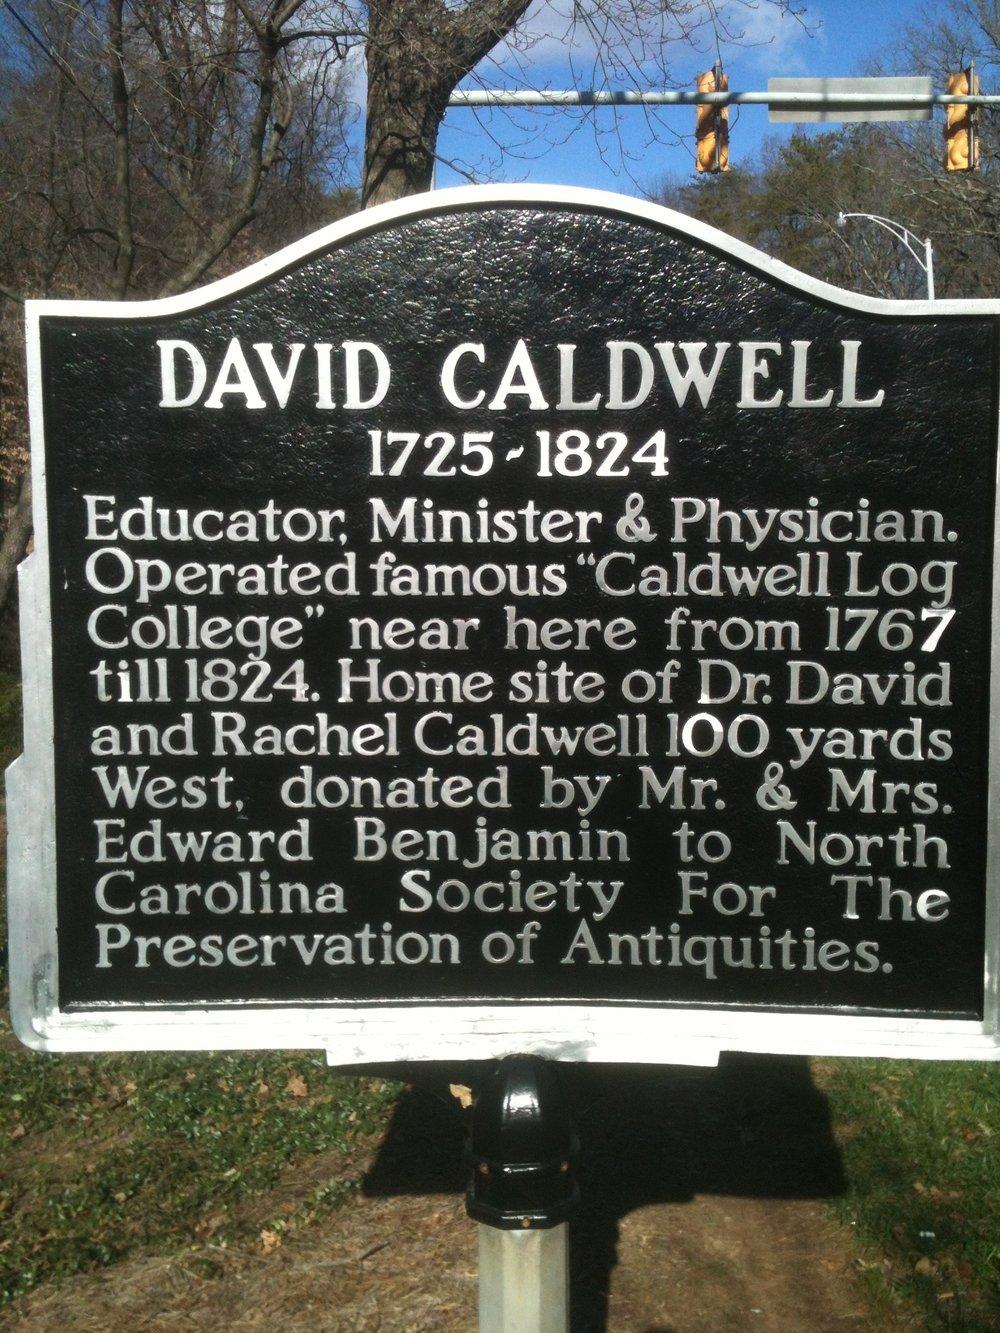 Caldwell, David photo 2.jpg